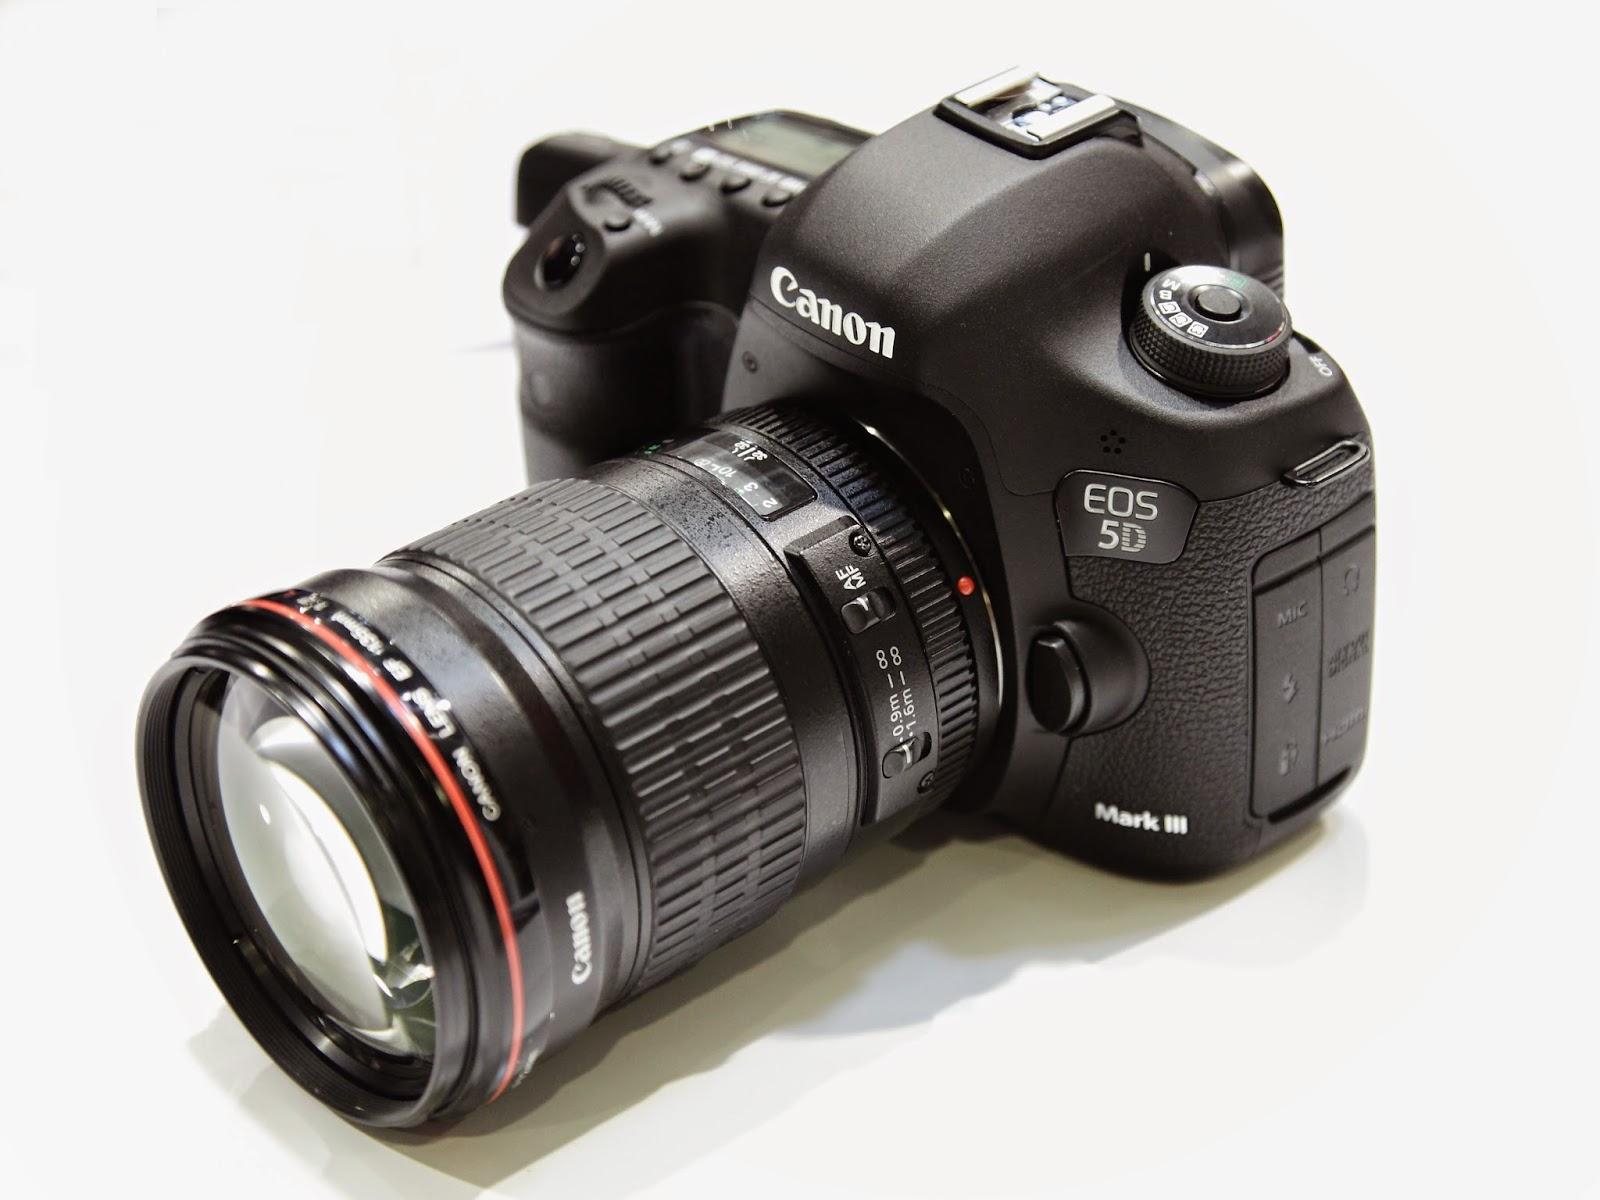 Canon 5D EOS Mark iii Price in Nigeria - Buy Canon Digital ...